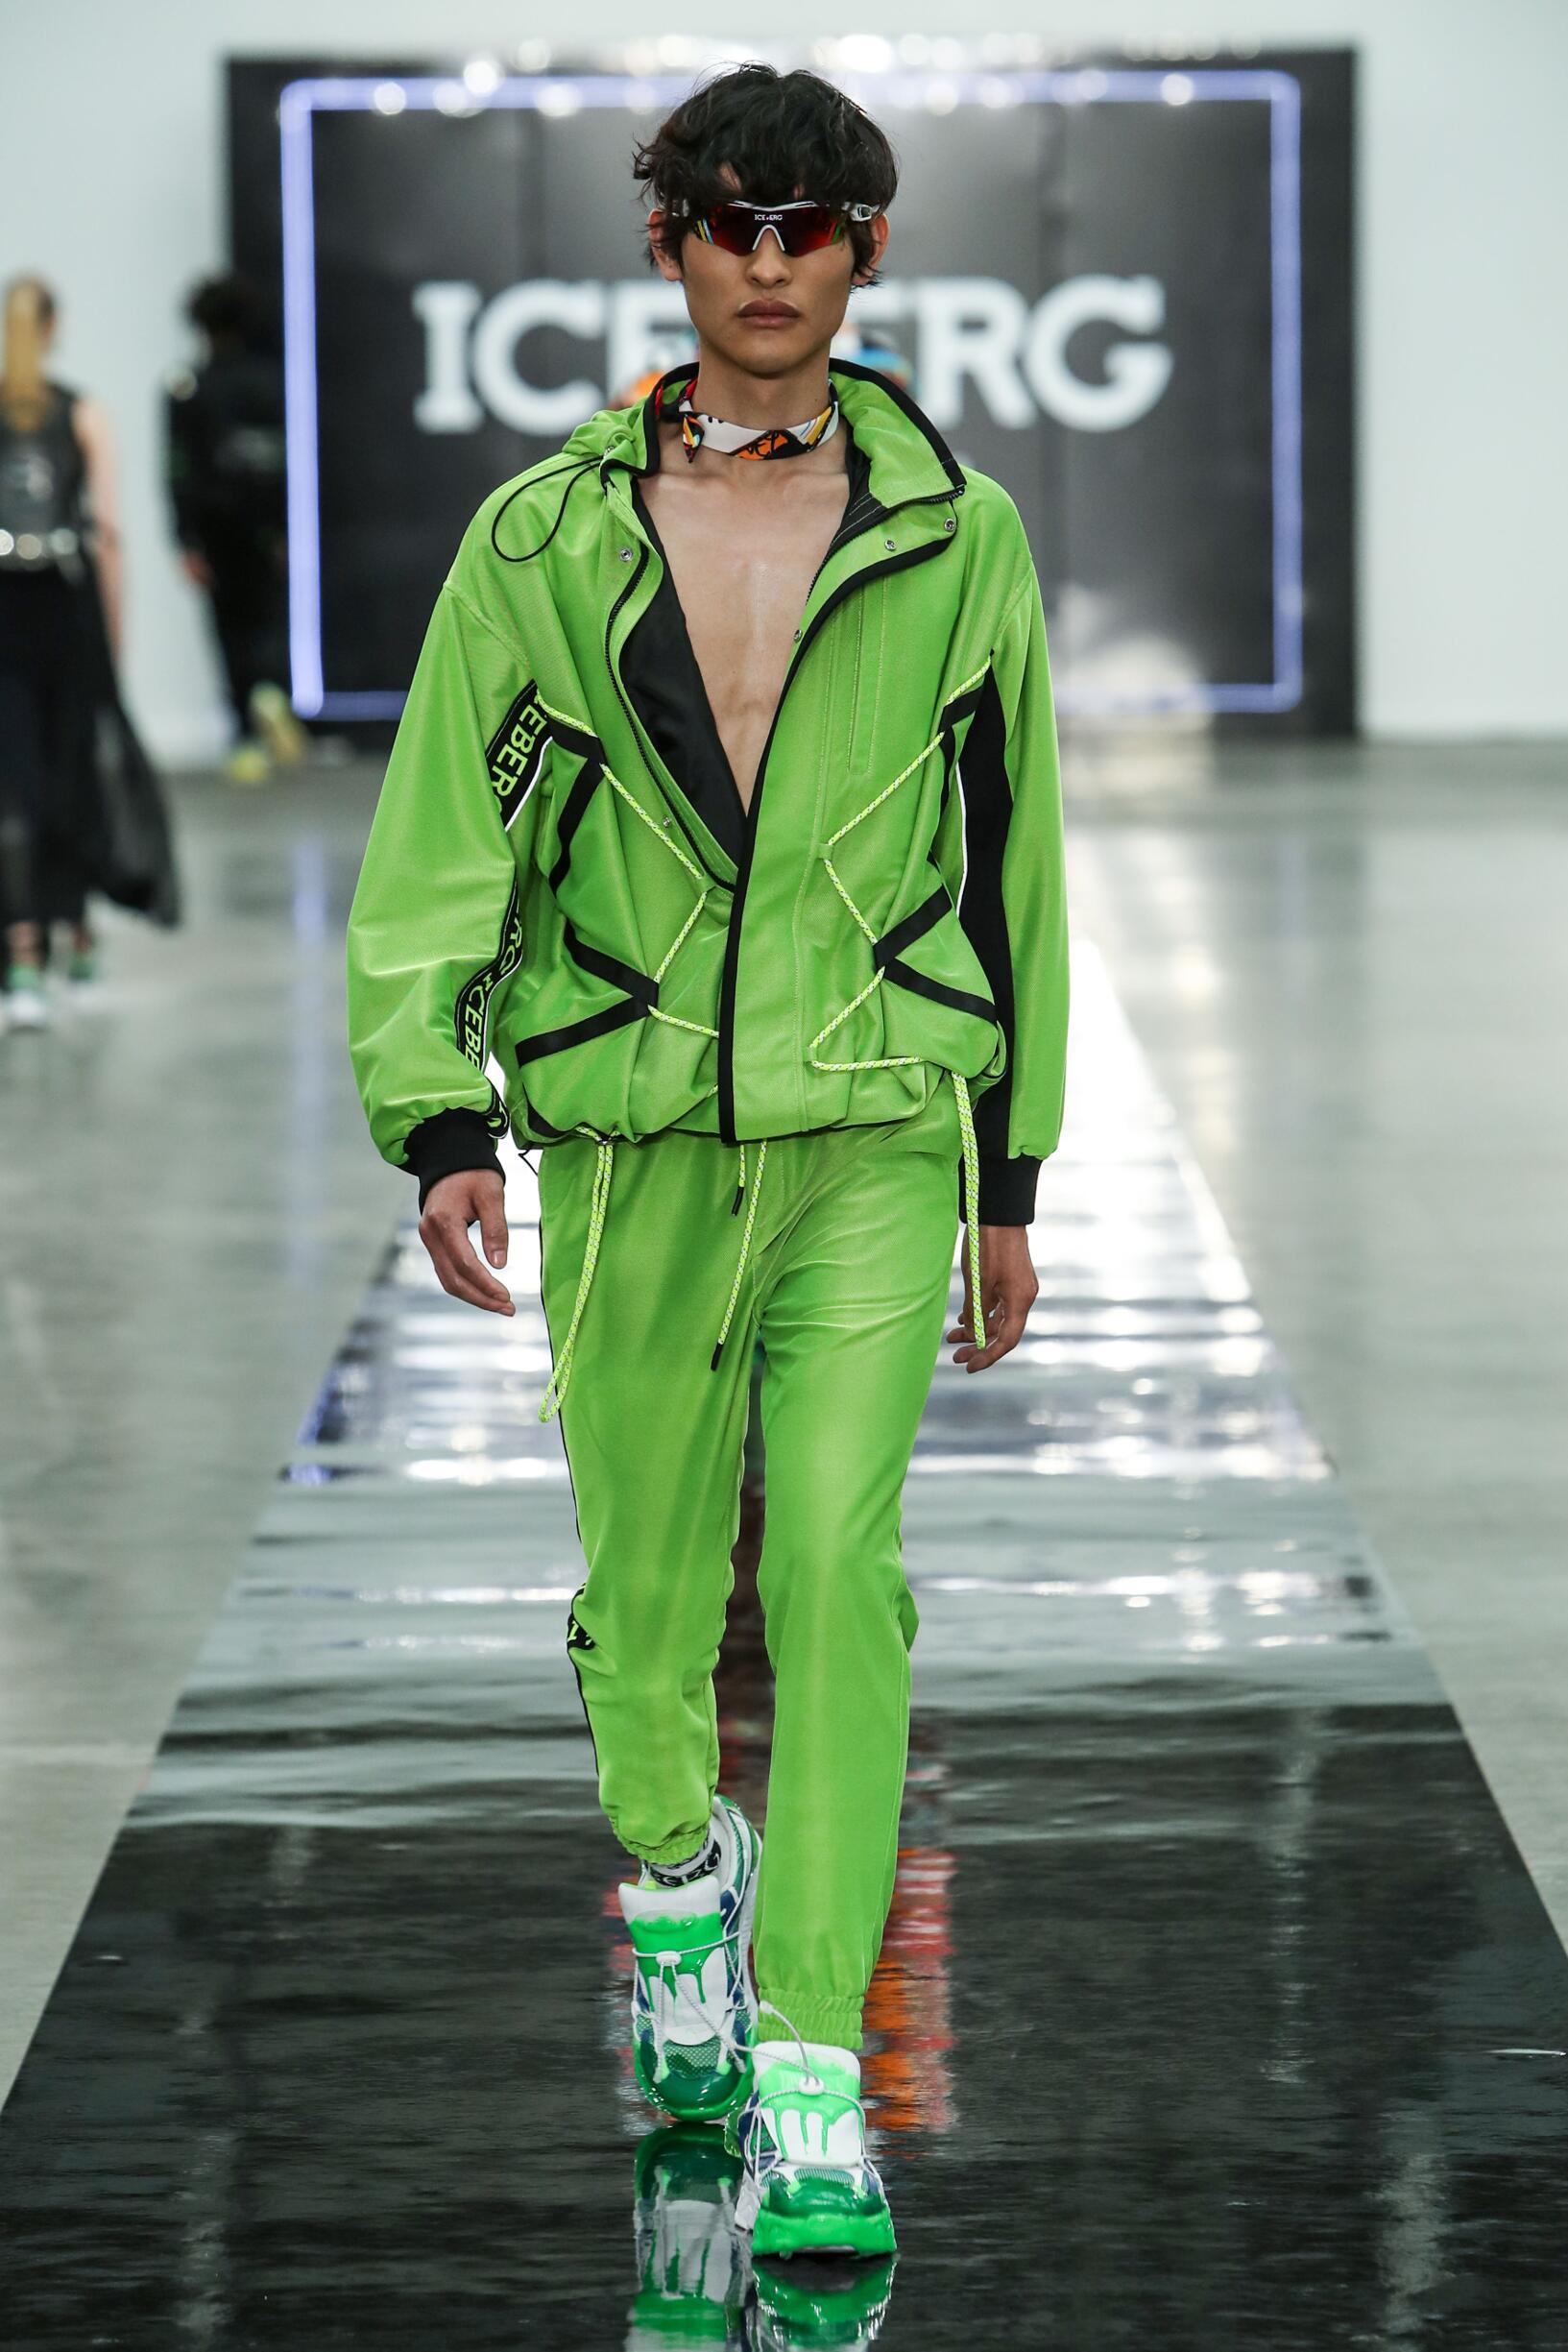 SS 2020 Iceberg Fashion Show London